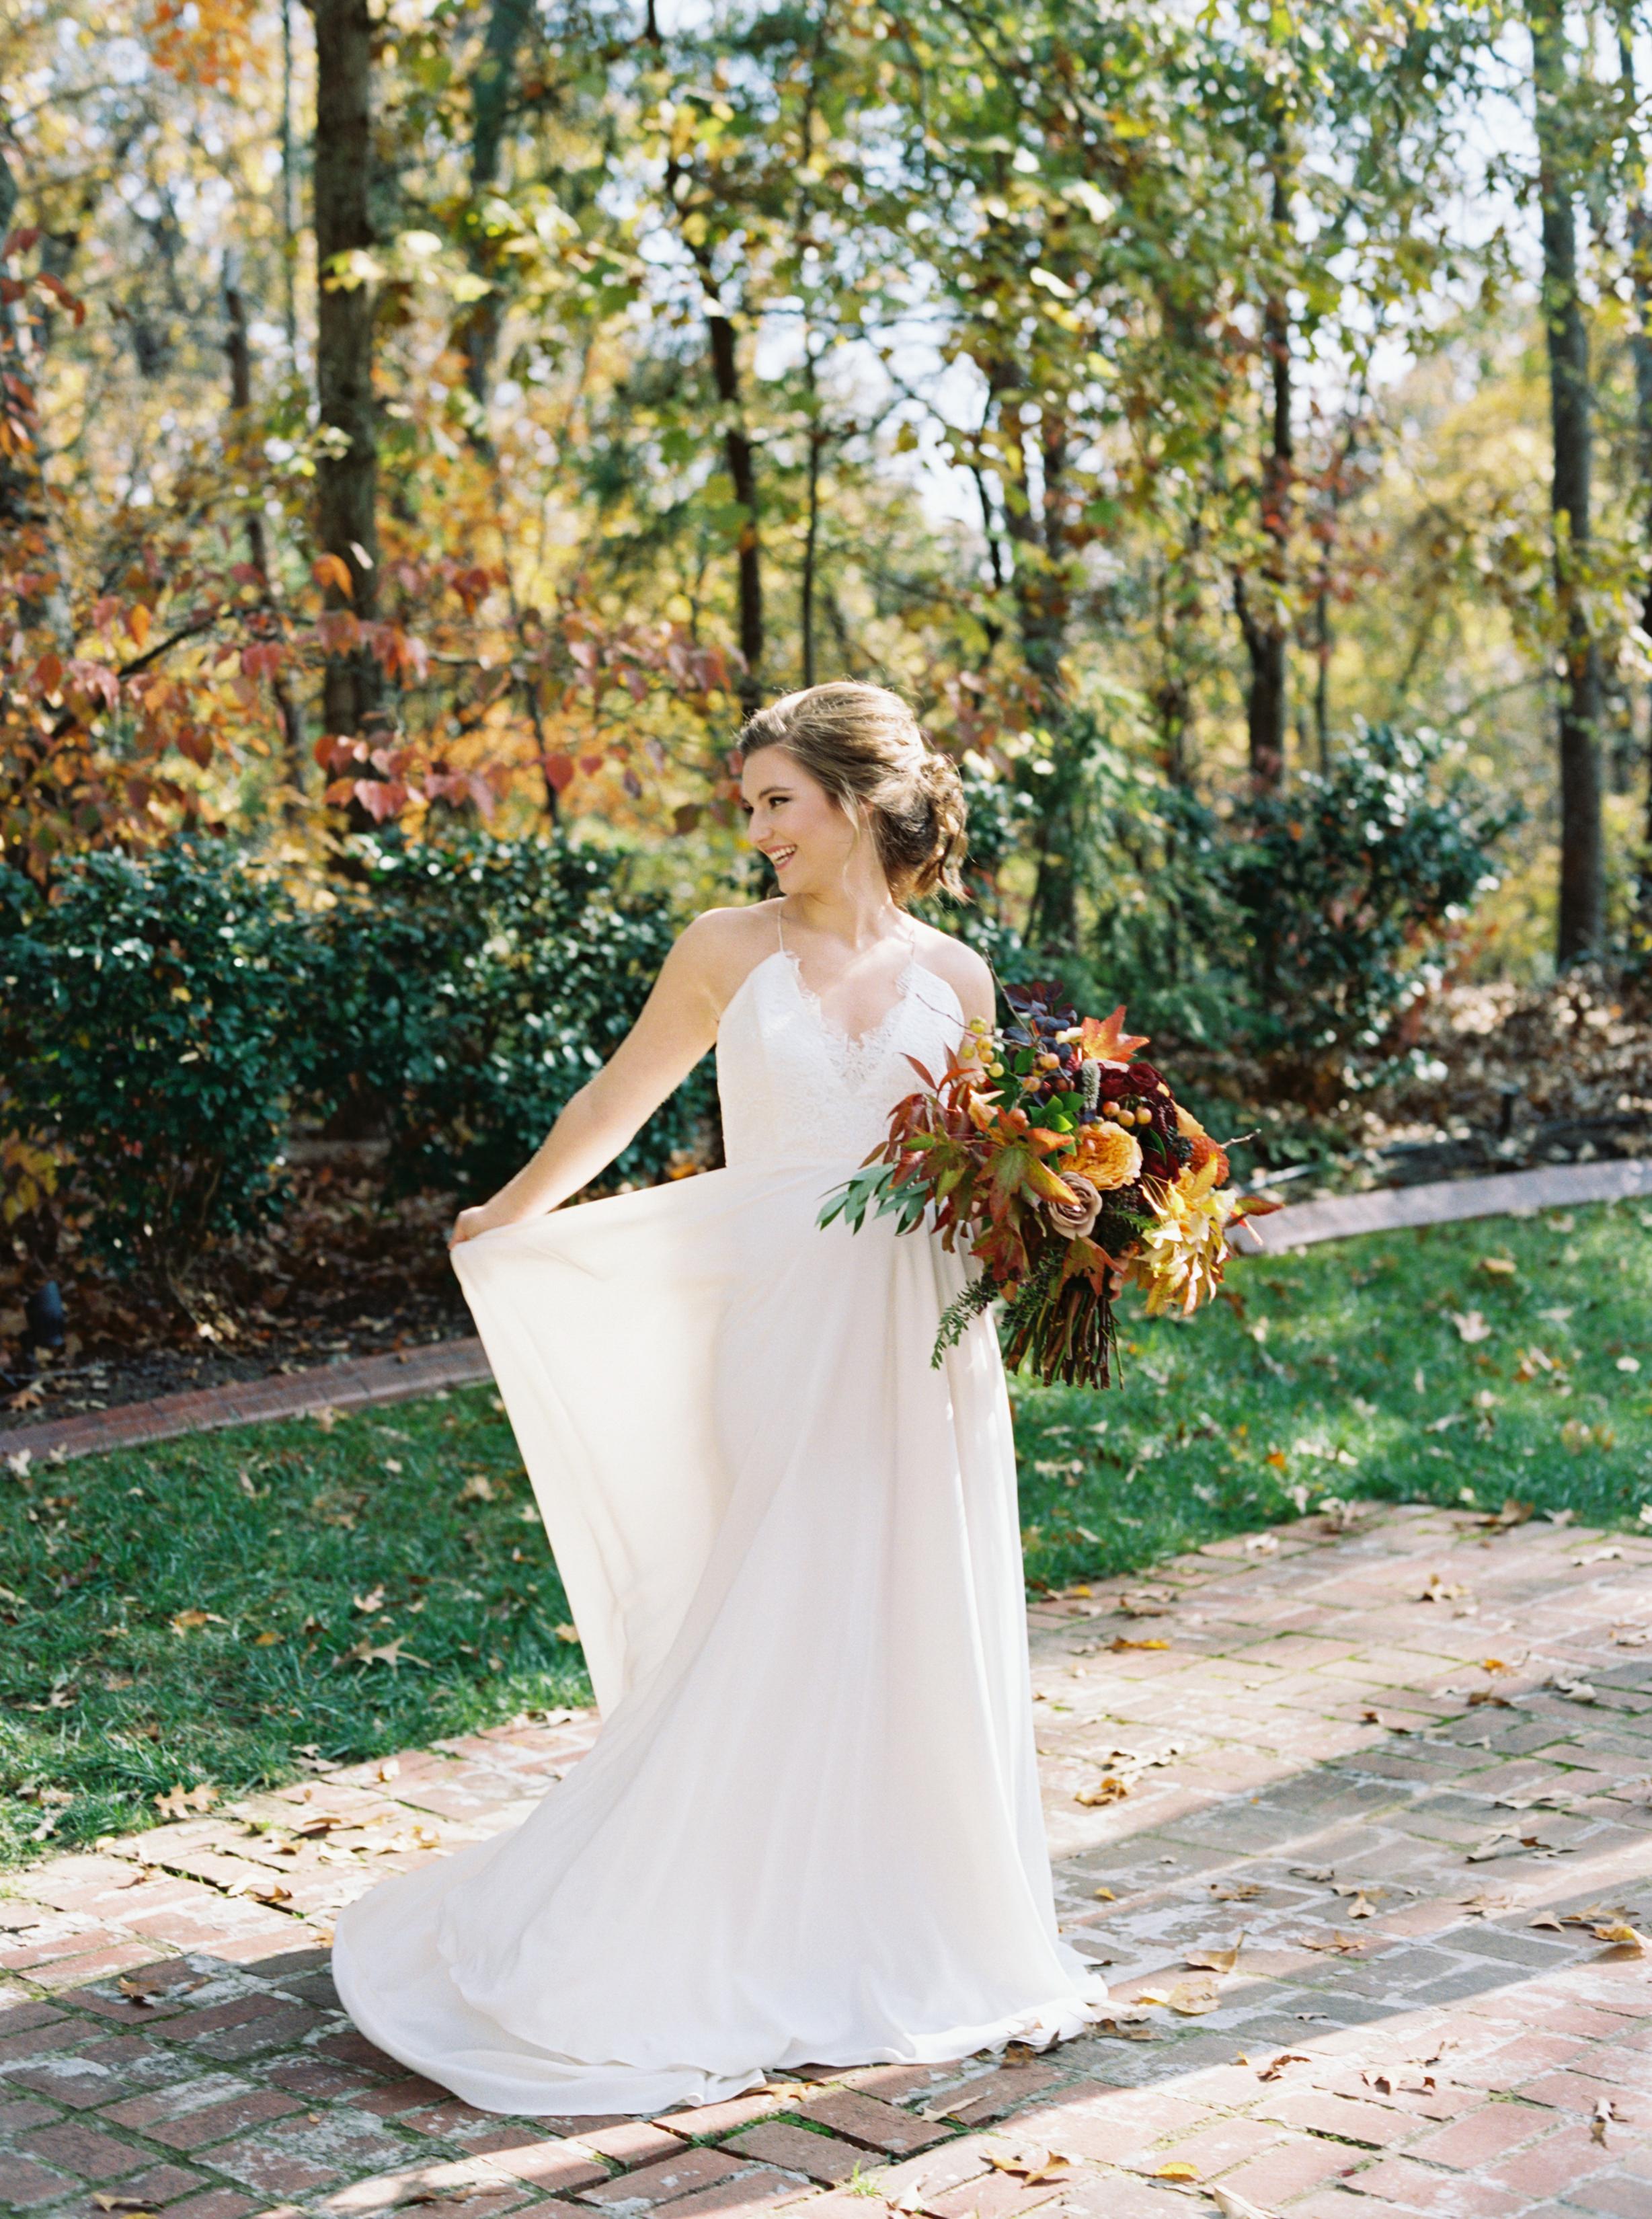 Wheeler_House_Fall_Wedding_Inspiration_Abigail_Malone_Photography-72.jpg